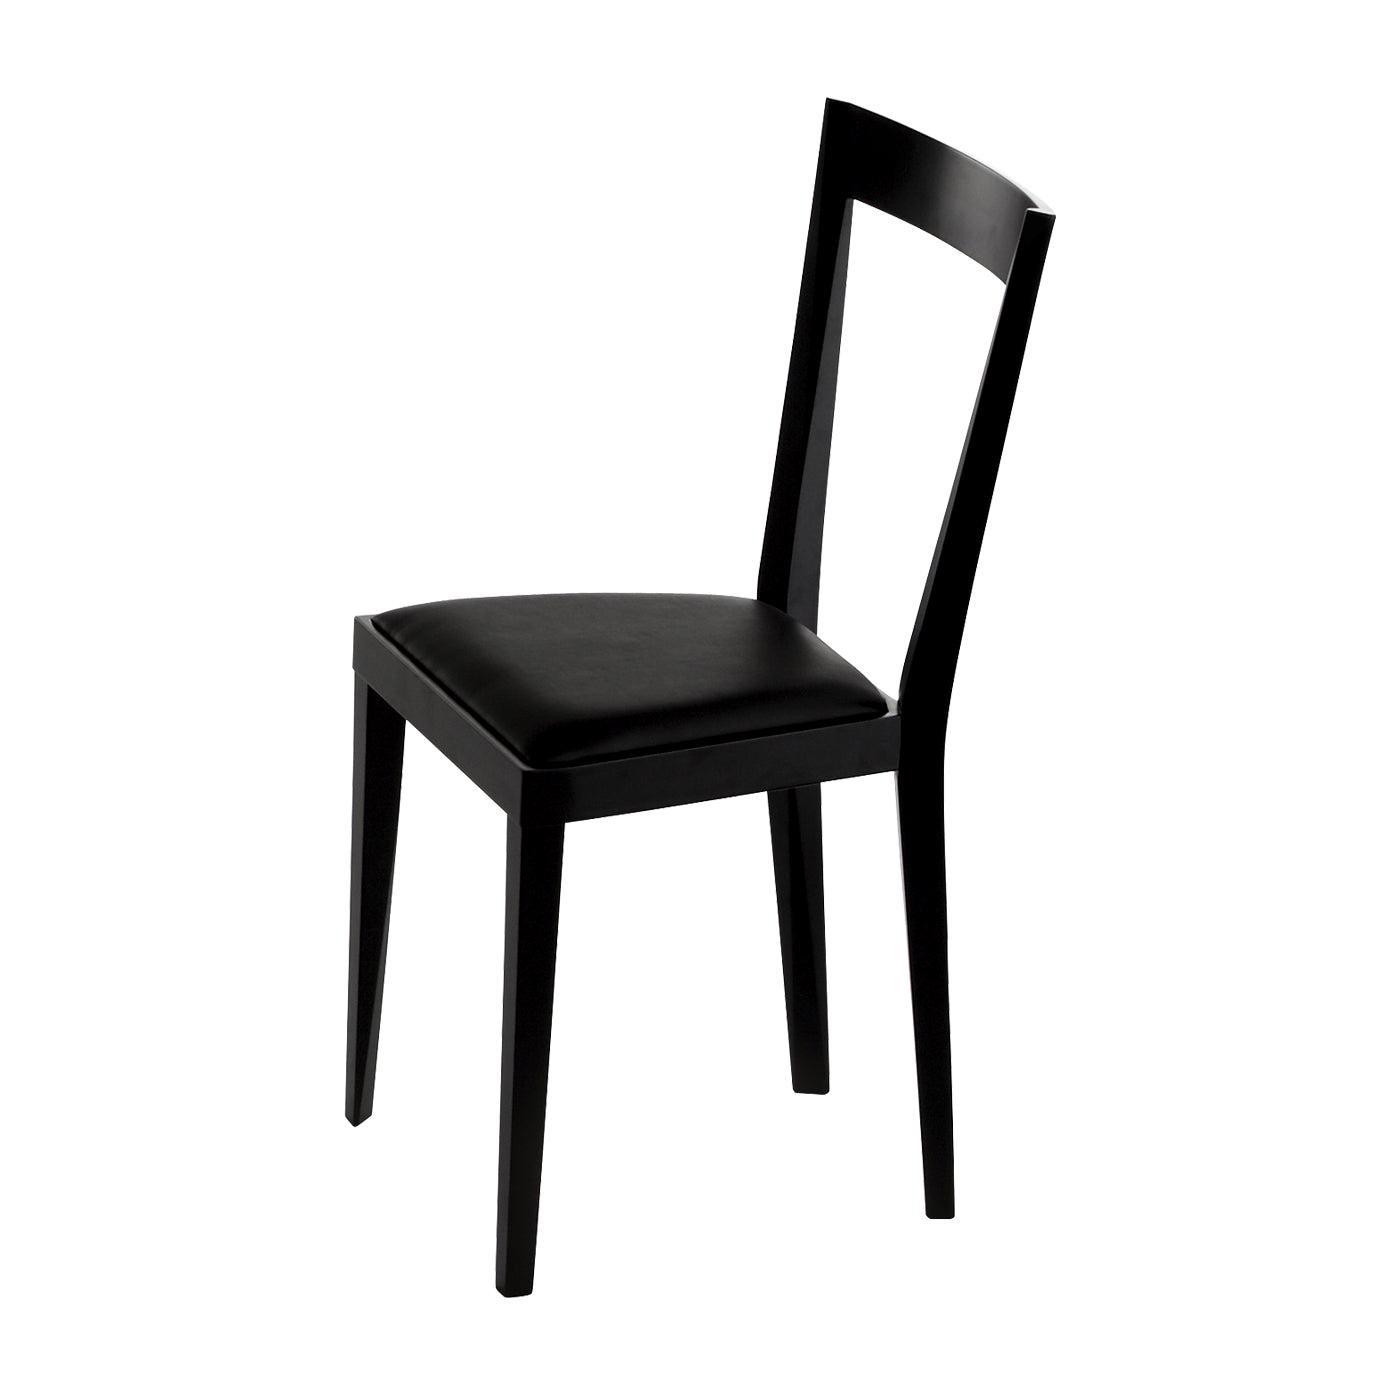 Set of 2 Livia Black Chairs II by Gio Ponti